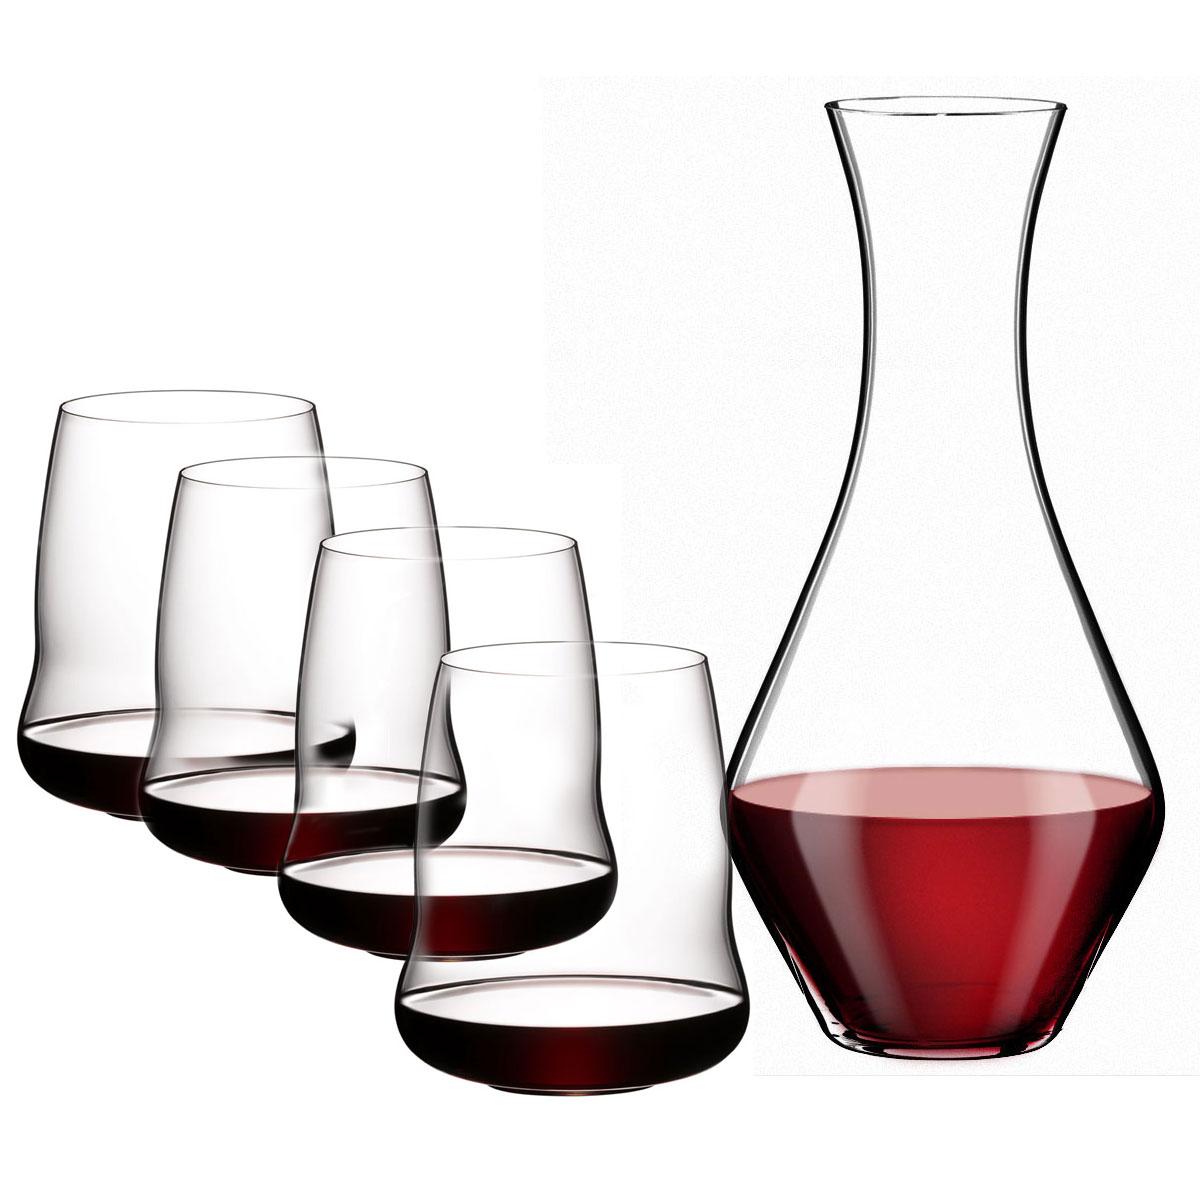 Riedel Stemless Winewings Set, Cabernet Glasses, Merlot Decanter